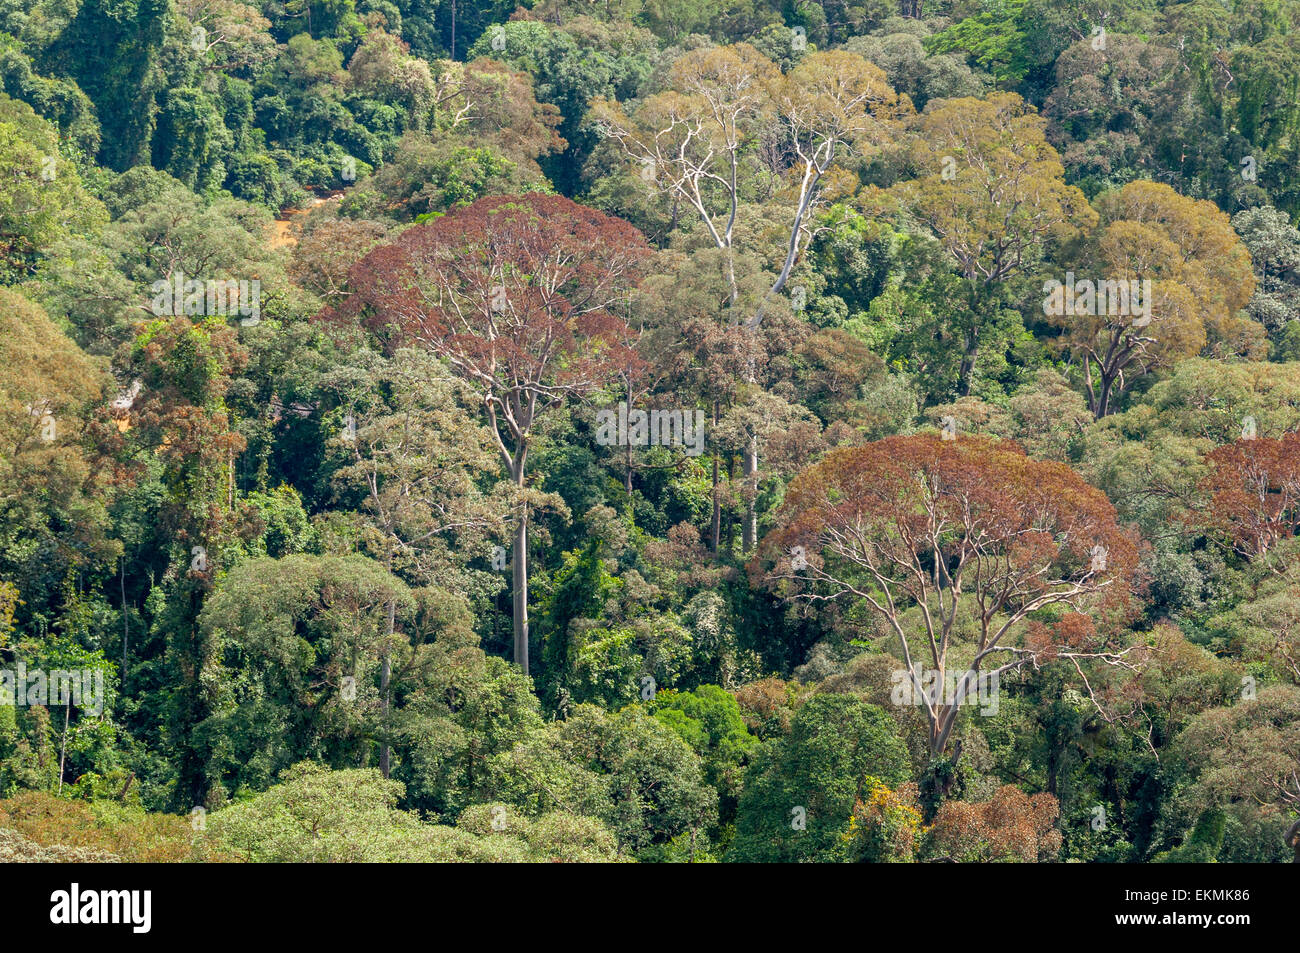 View of the Borneo rainforest trees, Malaysia Stock Photo